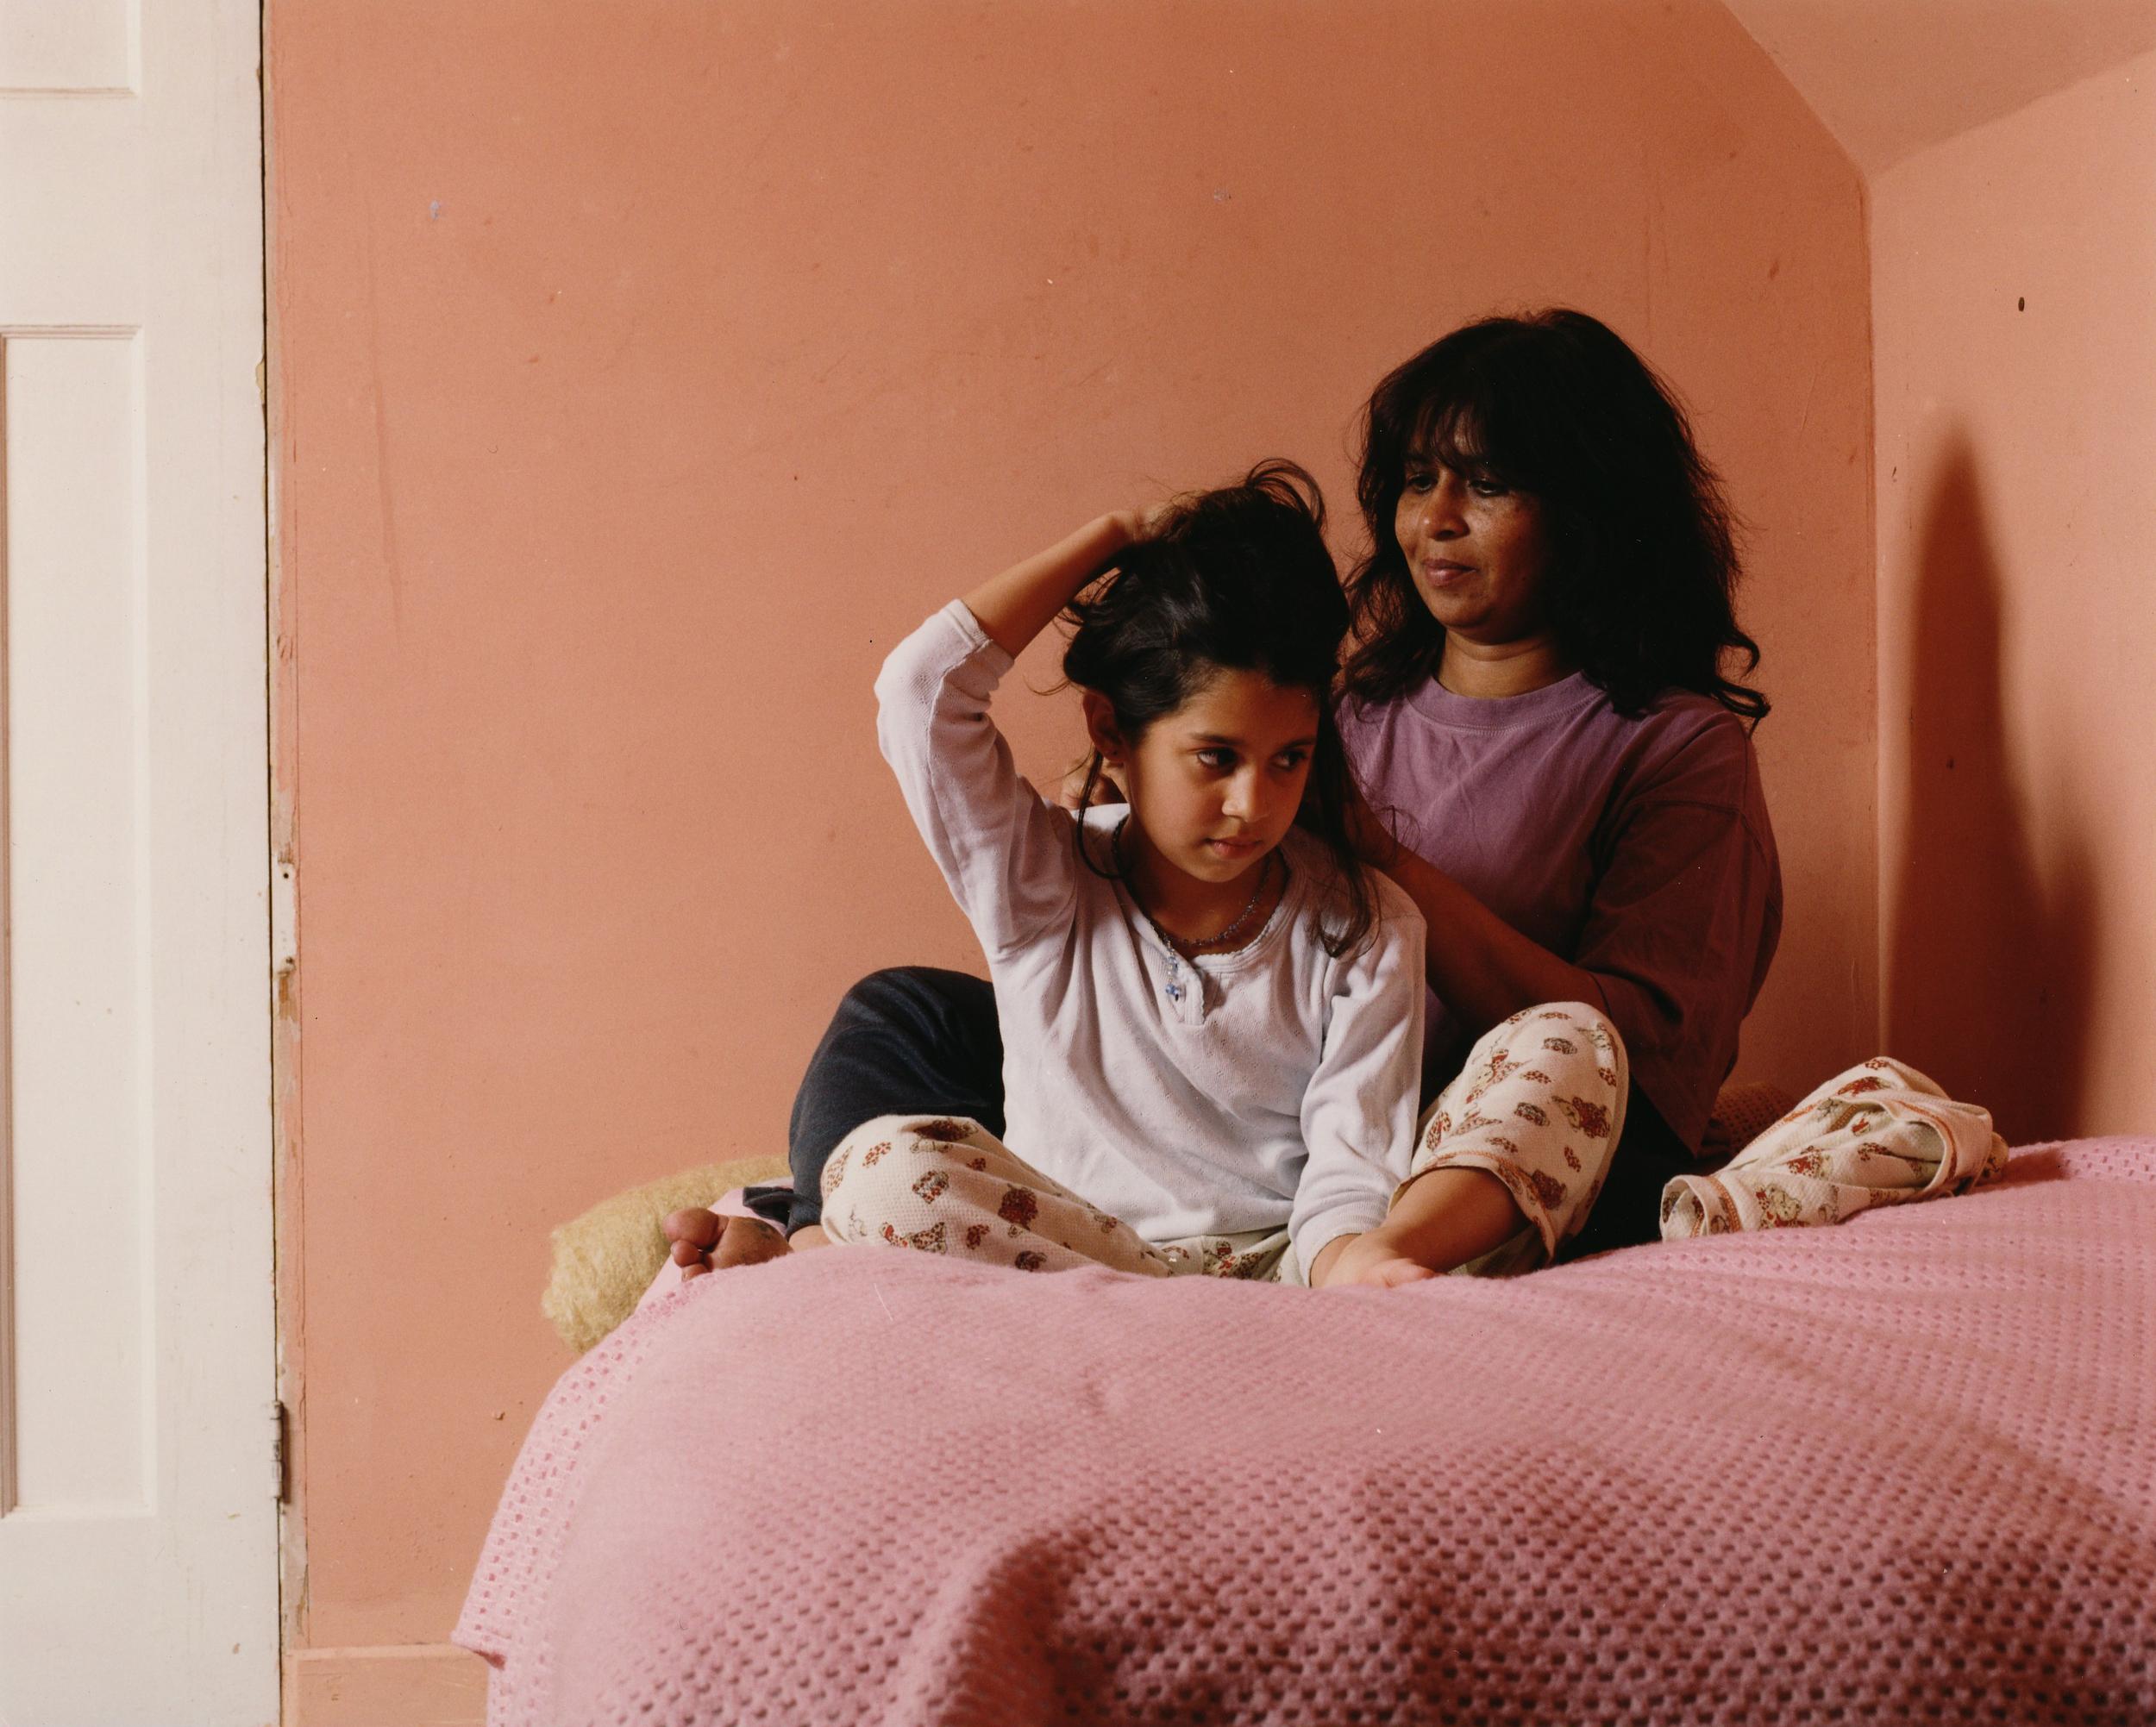 Like Mother Like Daughter VI. 2000